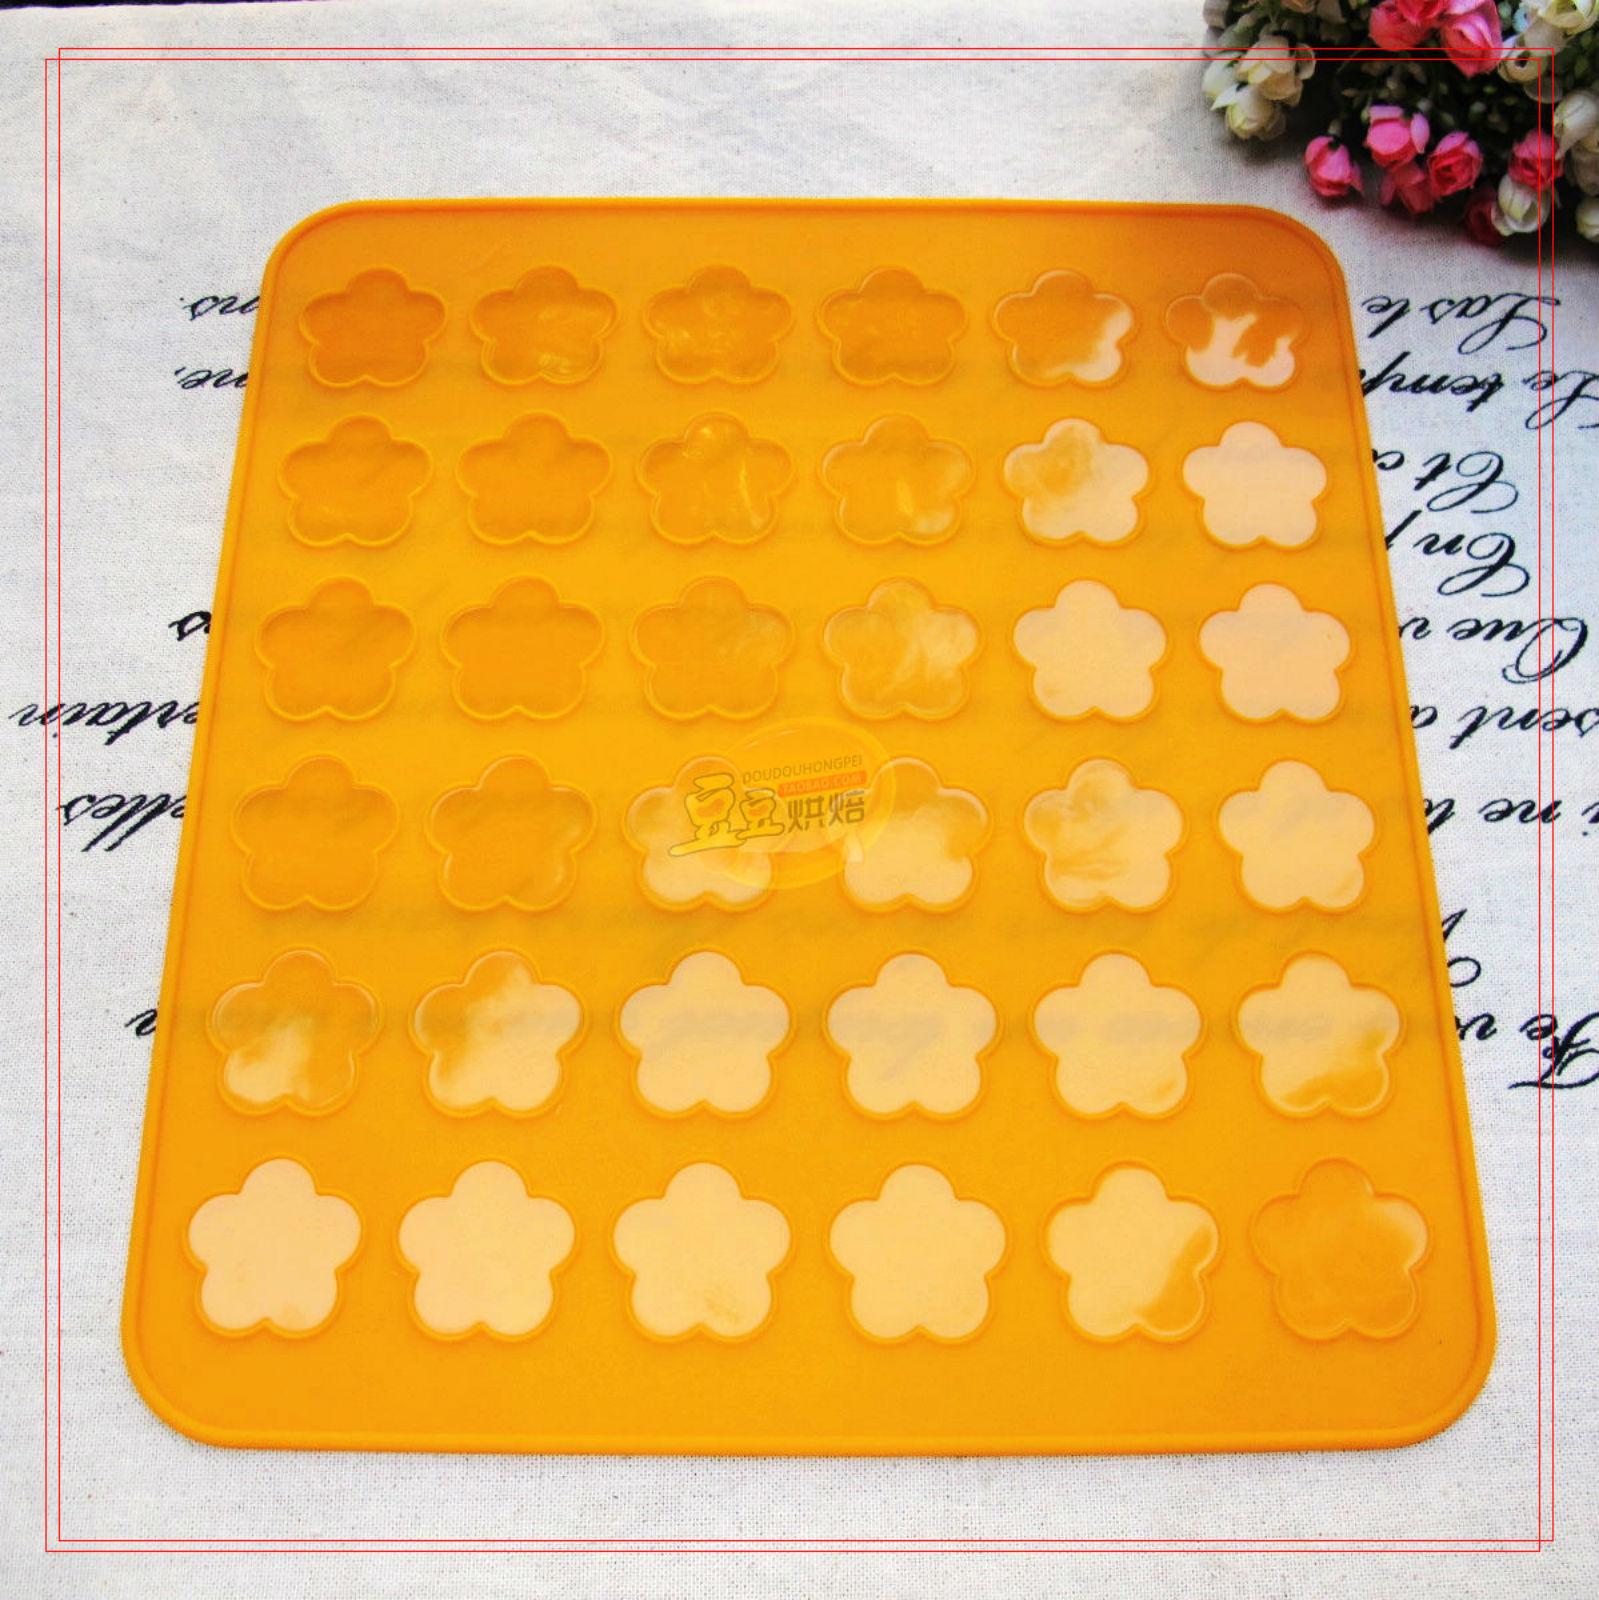 Macaroon Silicone 28 5x26 Plum Flower Baking Mat Cookies